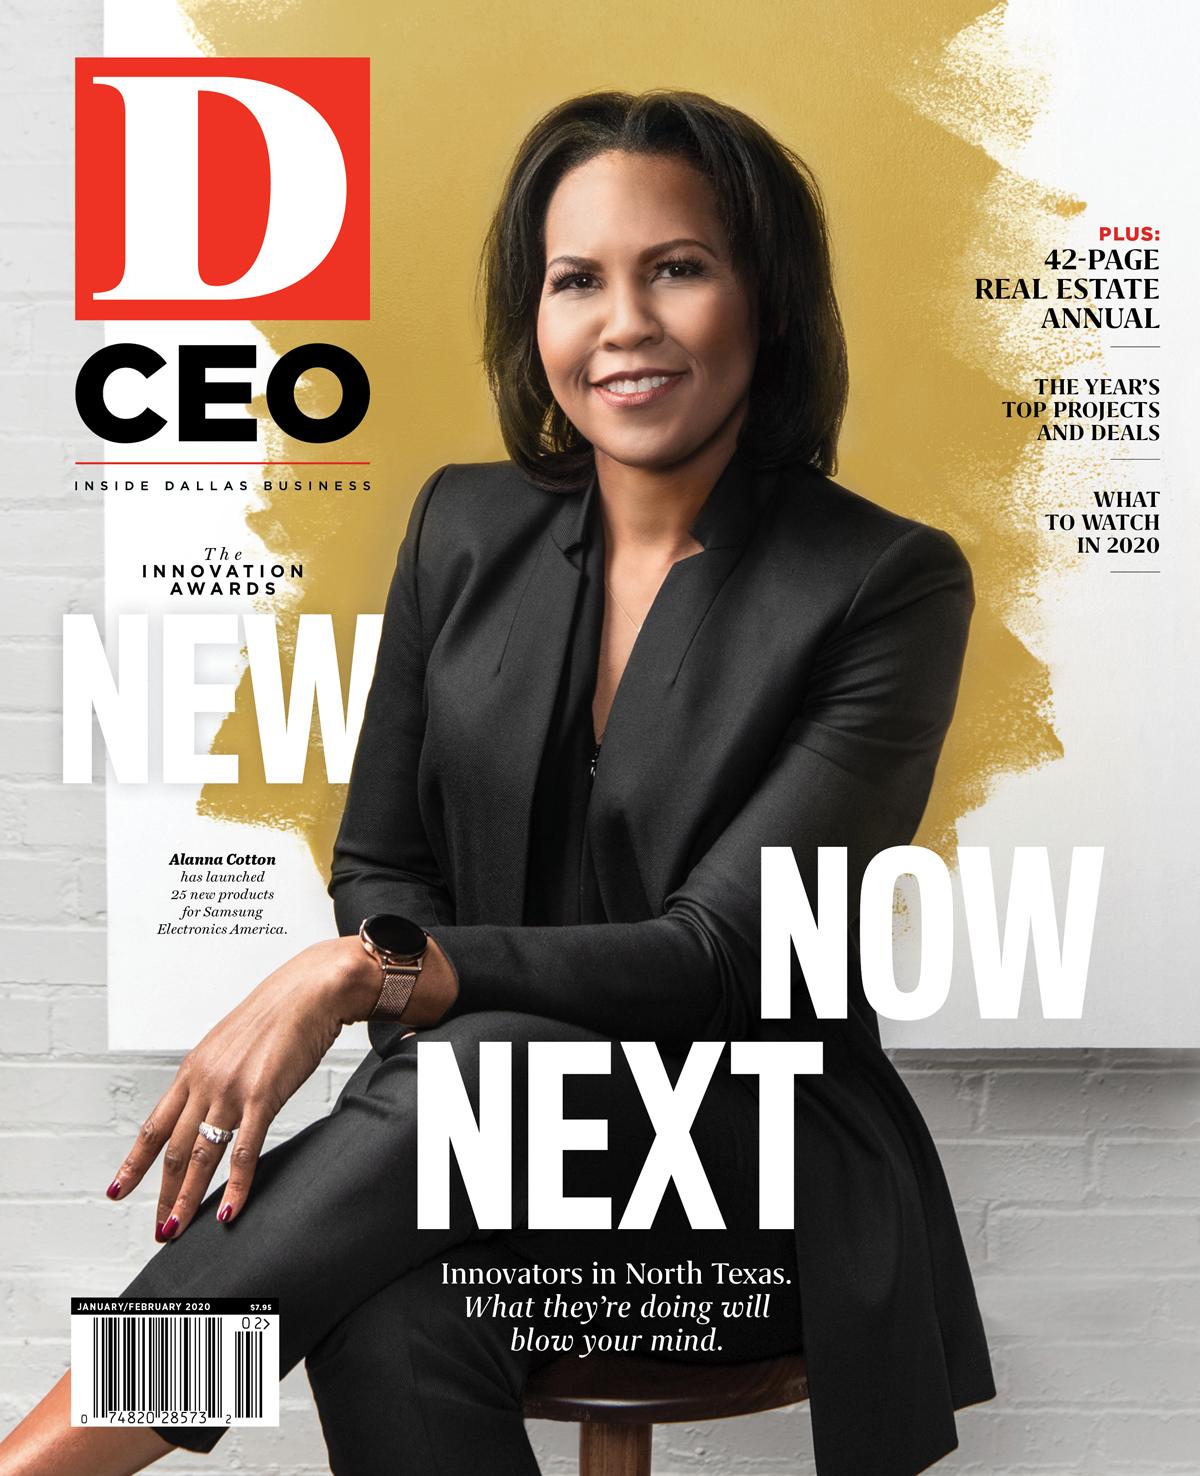 January-February 2020 cover